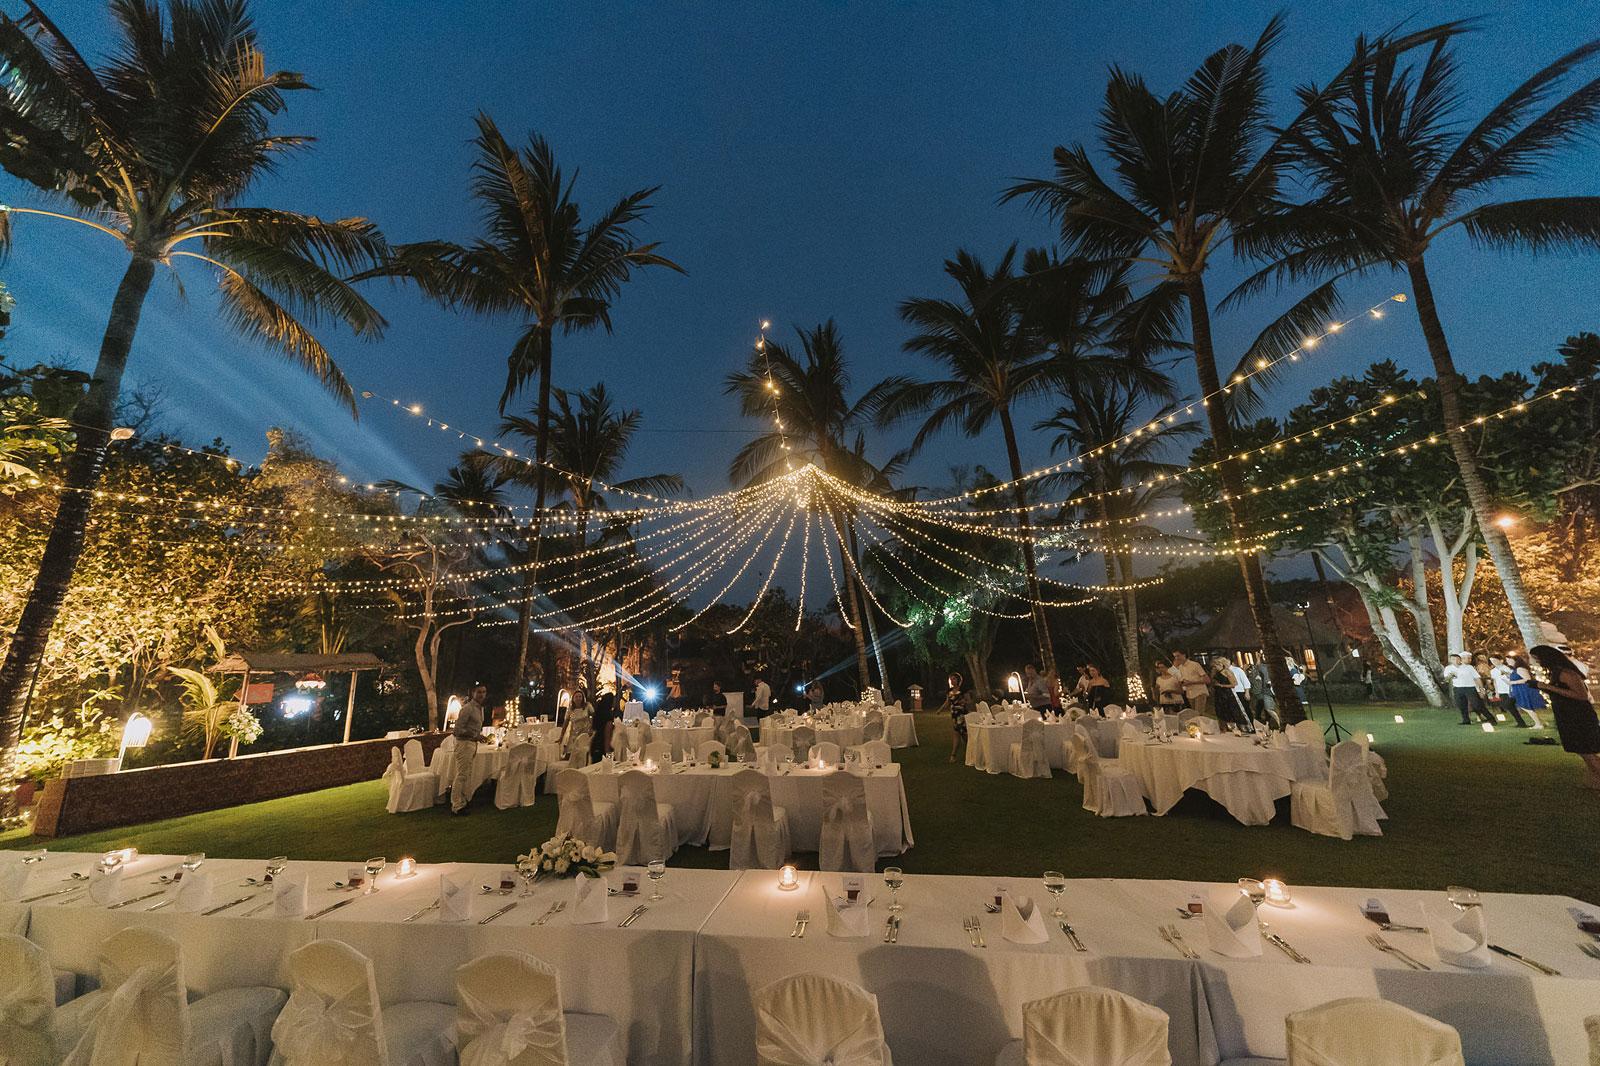 newfound-j-j-bali-nusa-dua-wedding-wedding-photographer-077-a